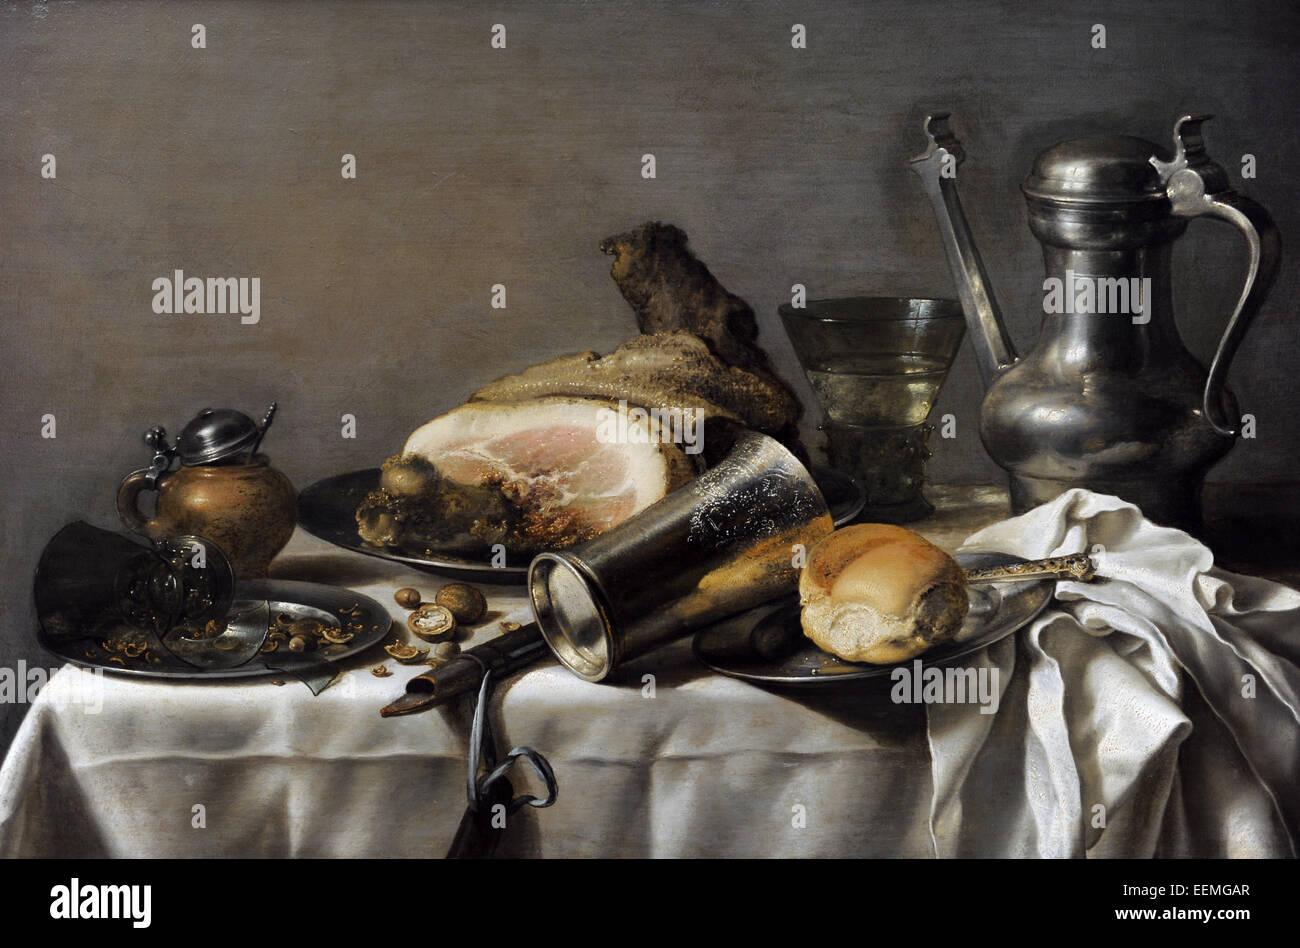 Pieter Claesz (1597-1660). Dutch Golden Age painter. Still life. Alte Pinakothek. Munich. Germany. - Stock Image